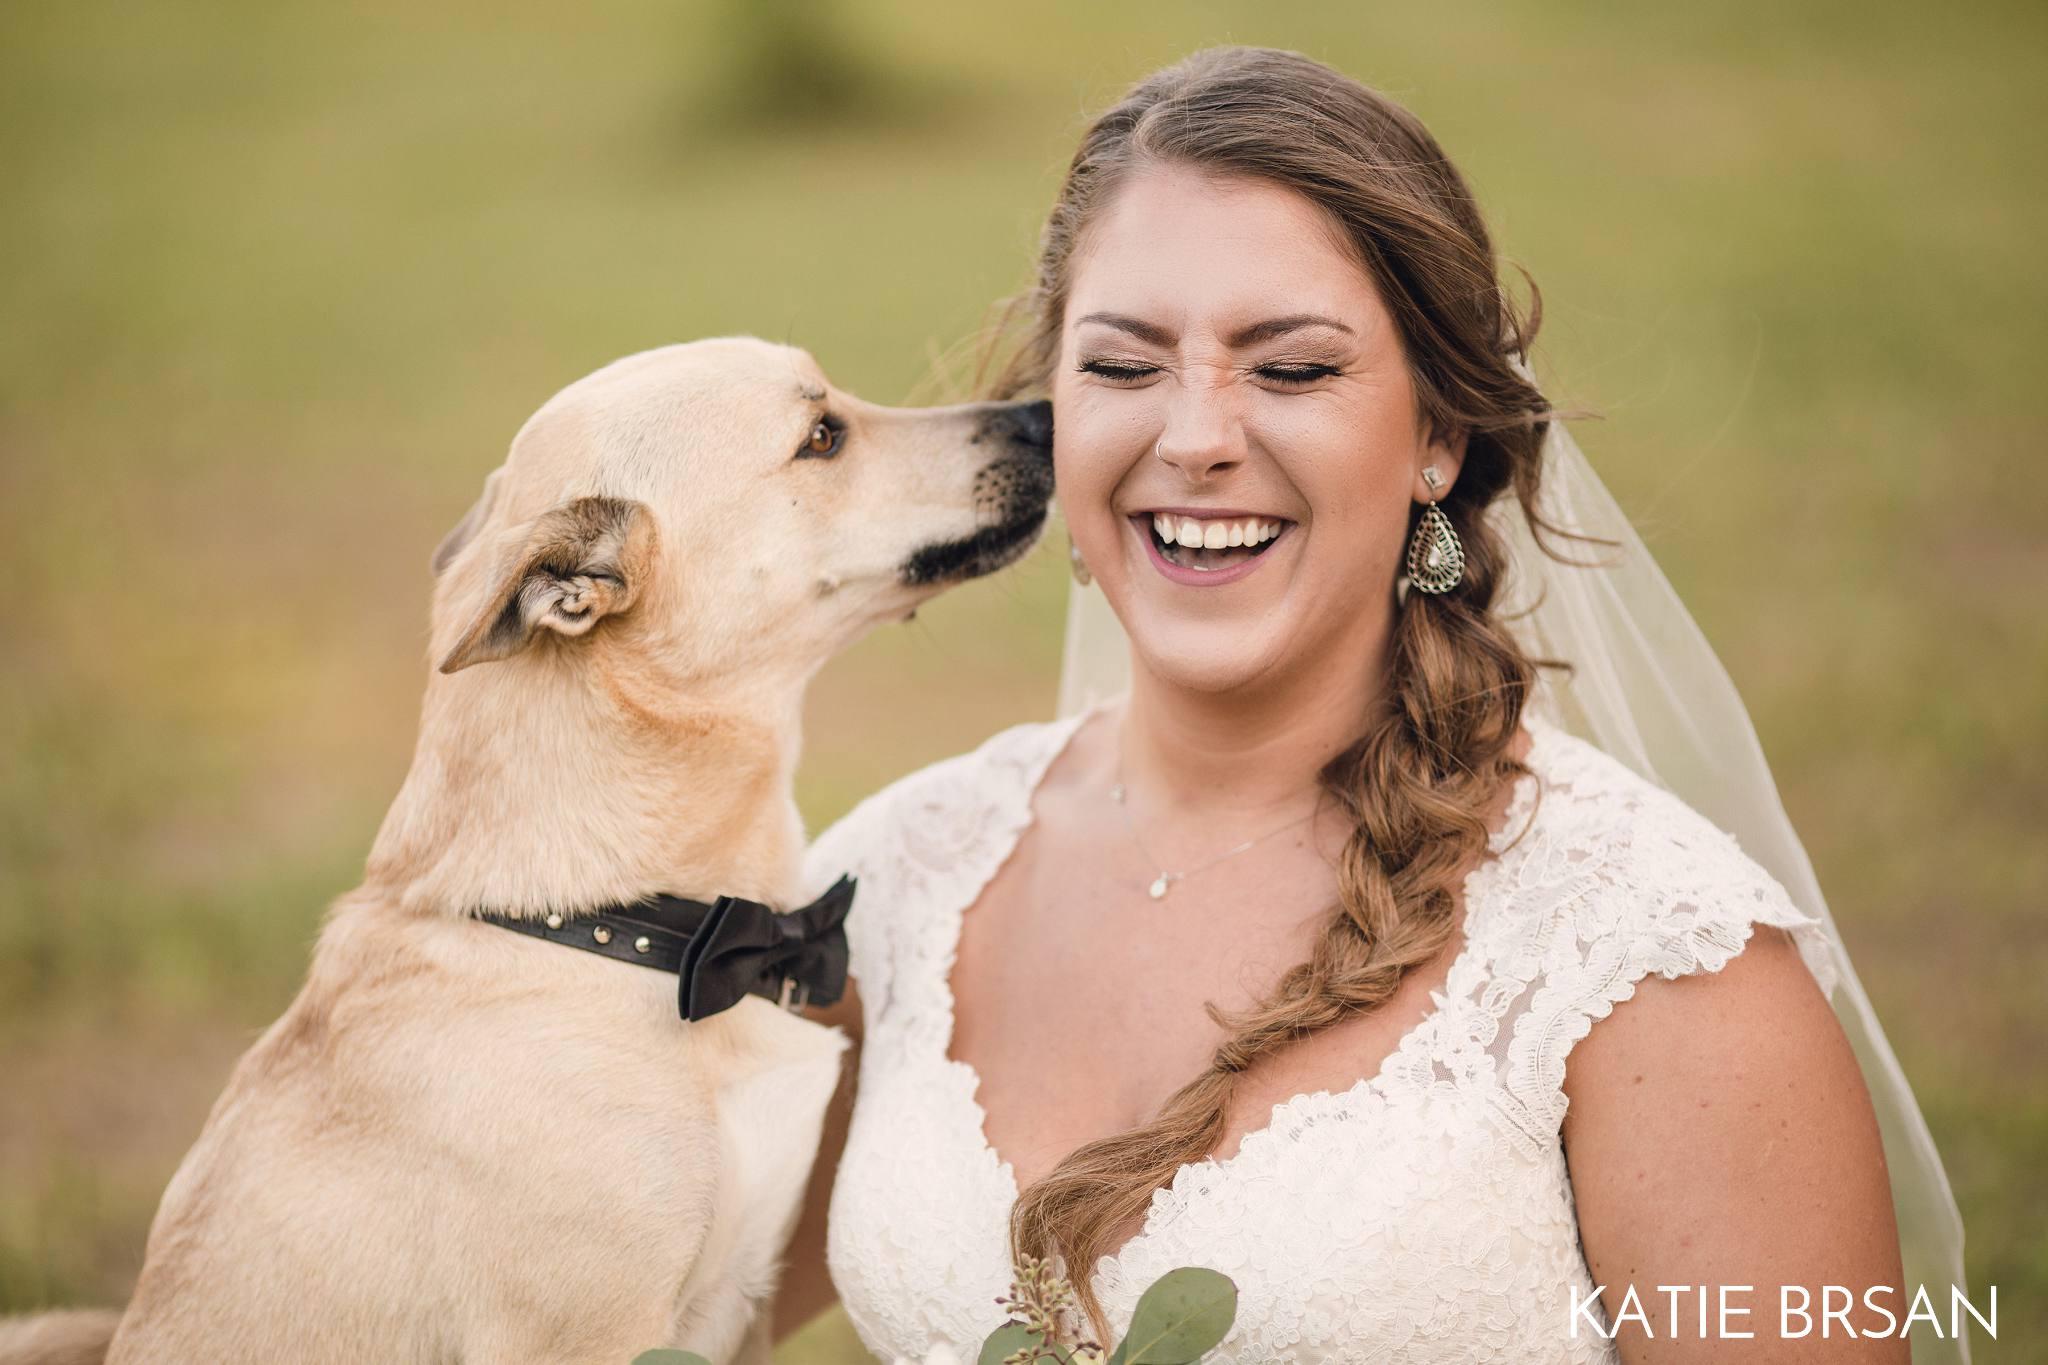 KatieBrsan-Bonfield-Backyard-Wedding_0412.jpg